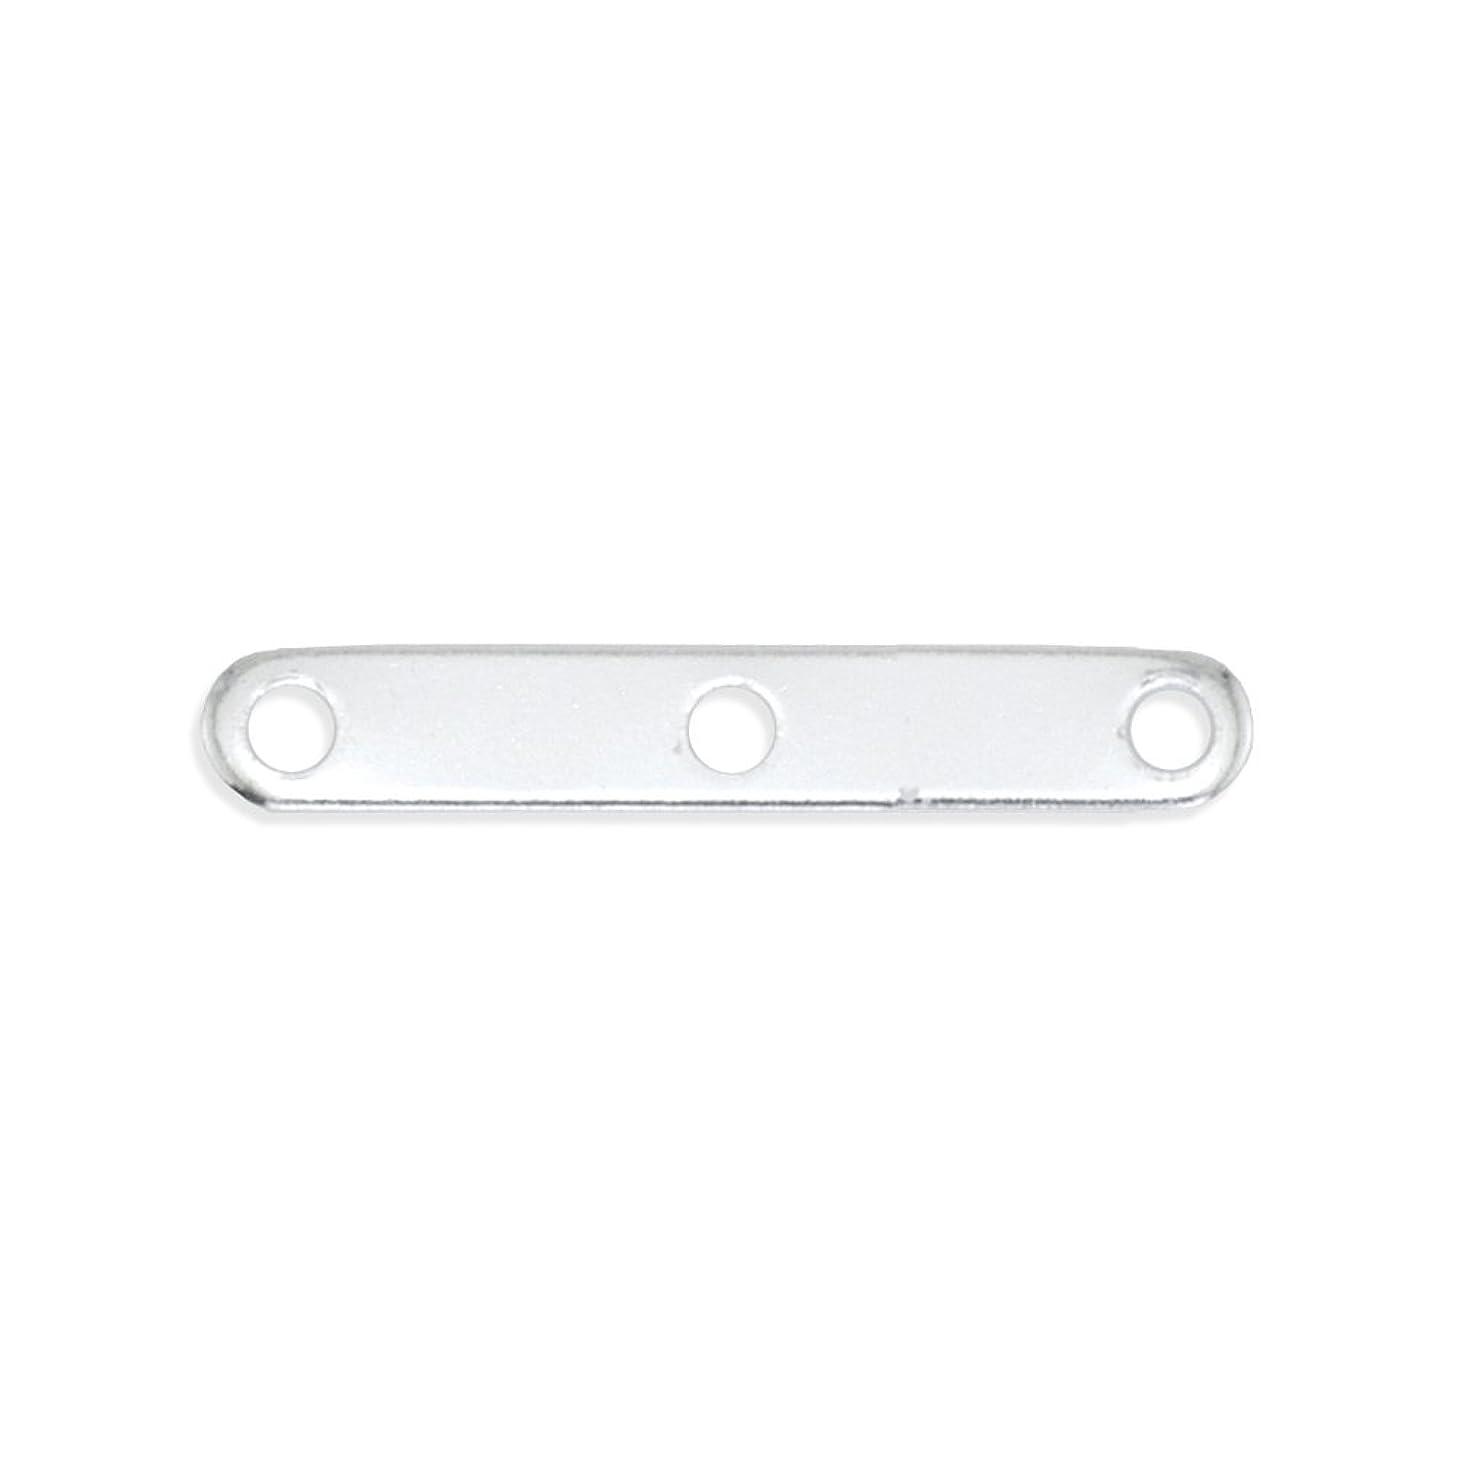 Beadalon W581 144-Piece 3-Hole Spacer Bar, Silver Plate